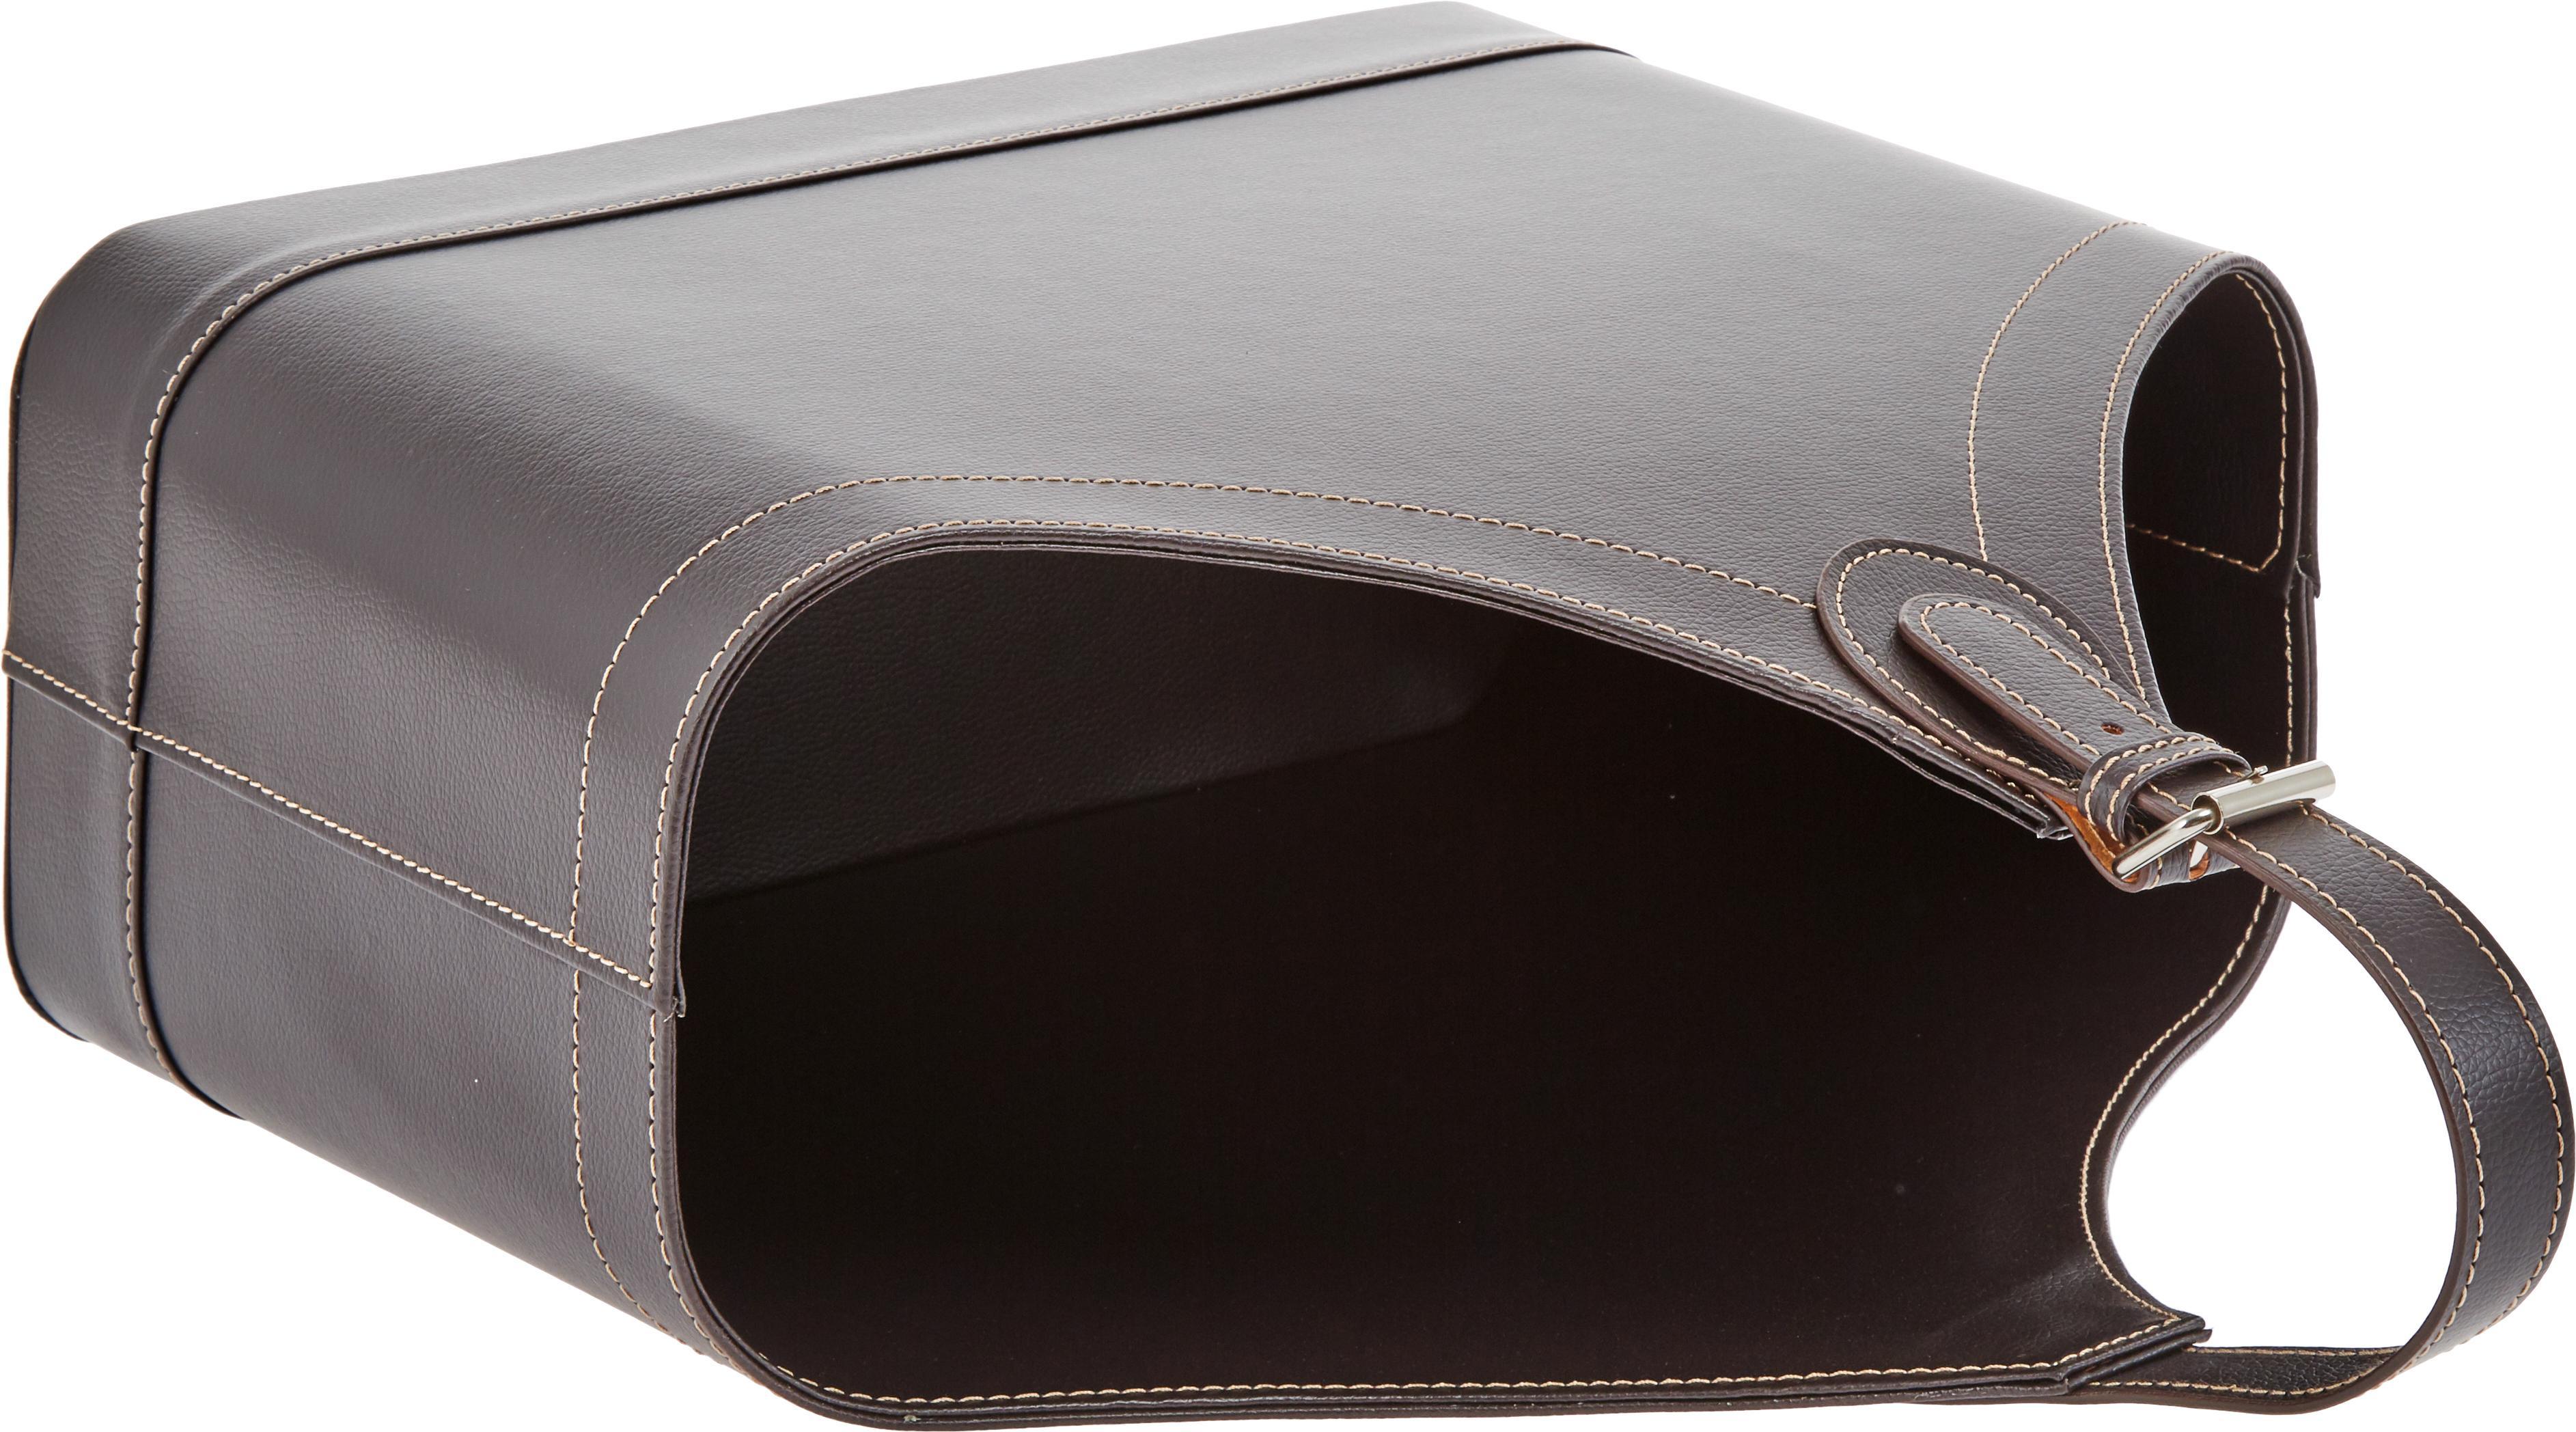 Zeitschriftenhalter Ready, Gestell: Karton, Bezug: Polyurethan, Verschluss: Metall, Zeitschriftenhalter: Braun<br>Nähte: Beige<br>Verschluss: Metall, 40 x 45 cm